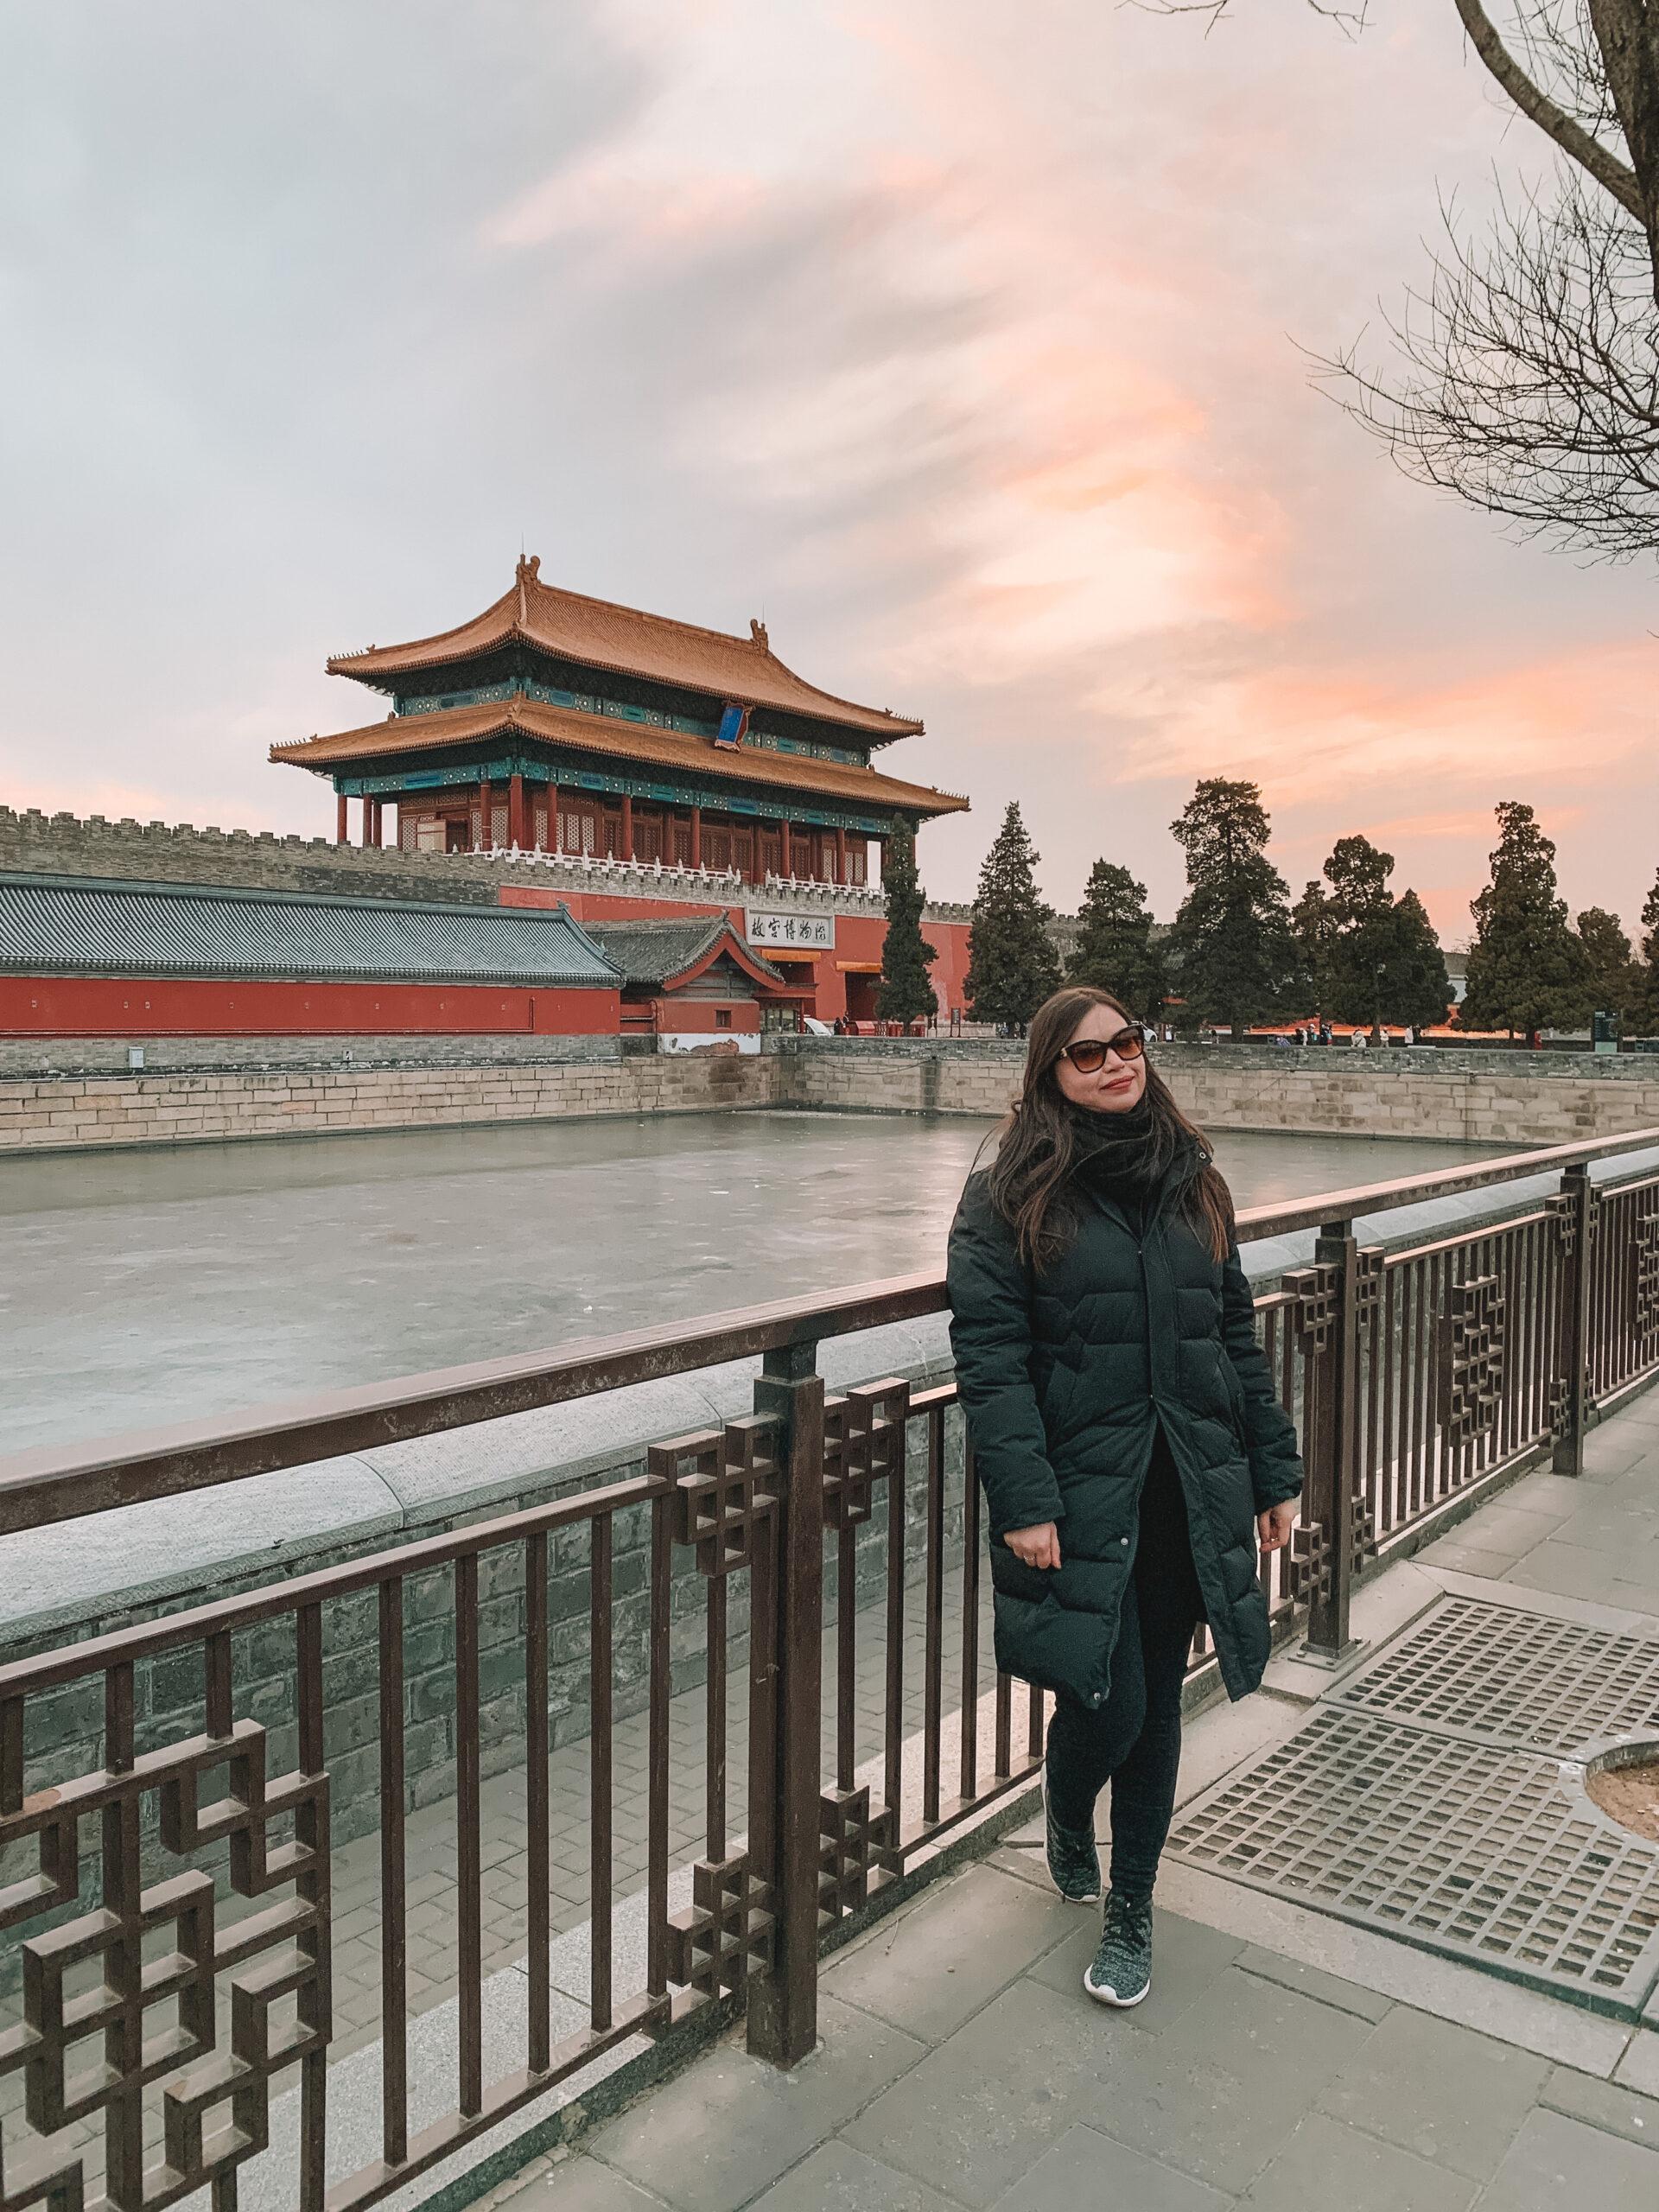 Descubra 11 Curiosidades sobre a China!